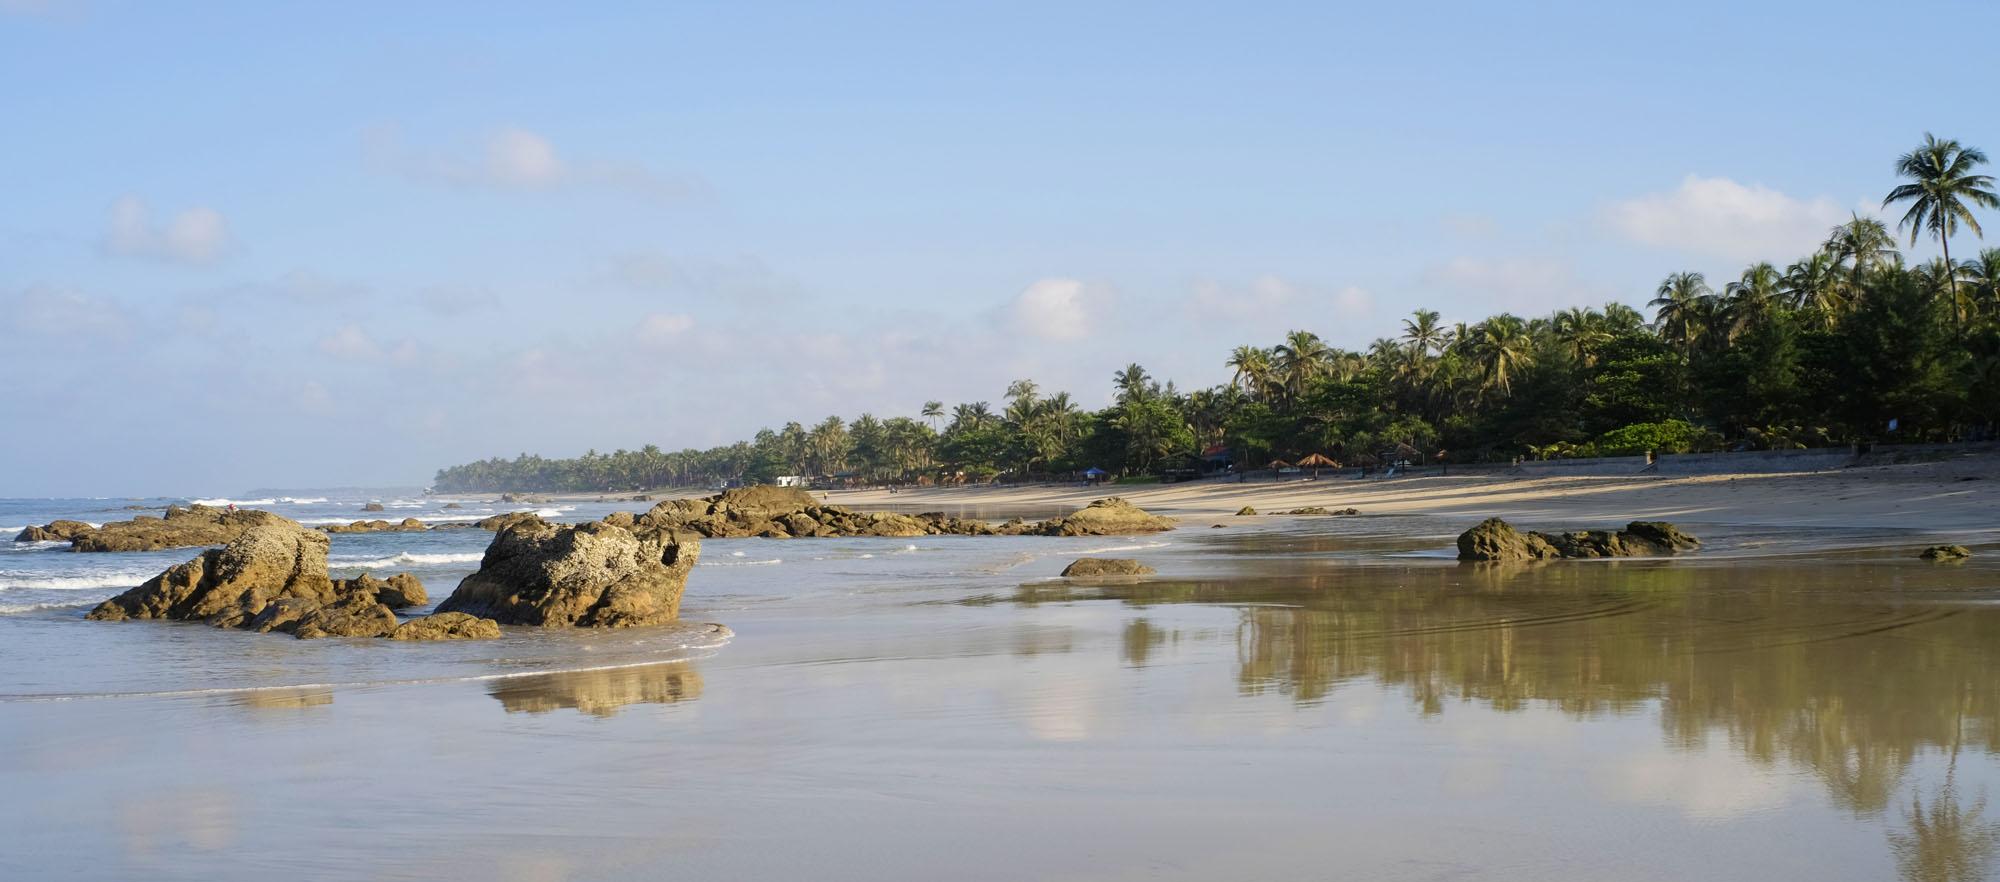 reise-ansichten Ngwe Saung Beach